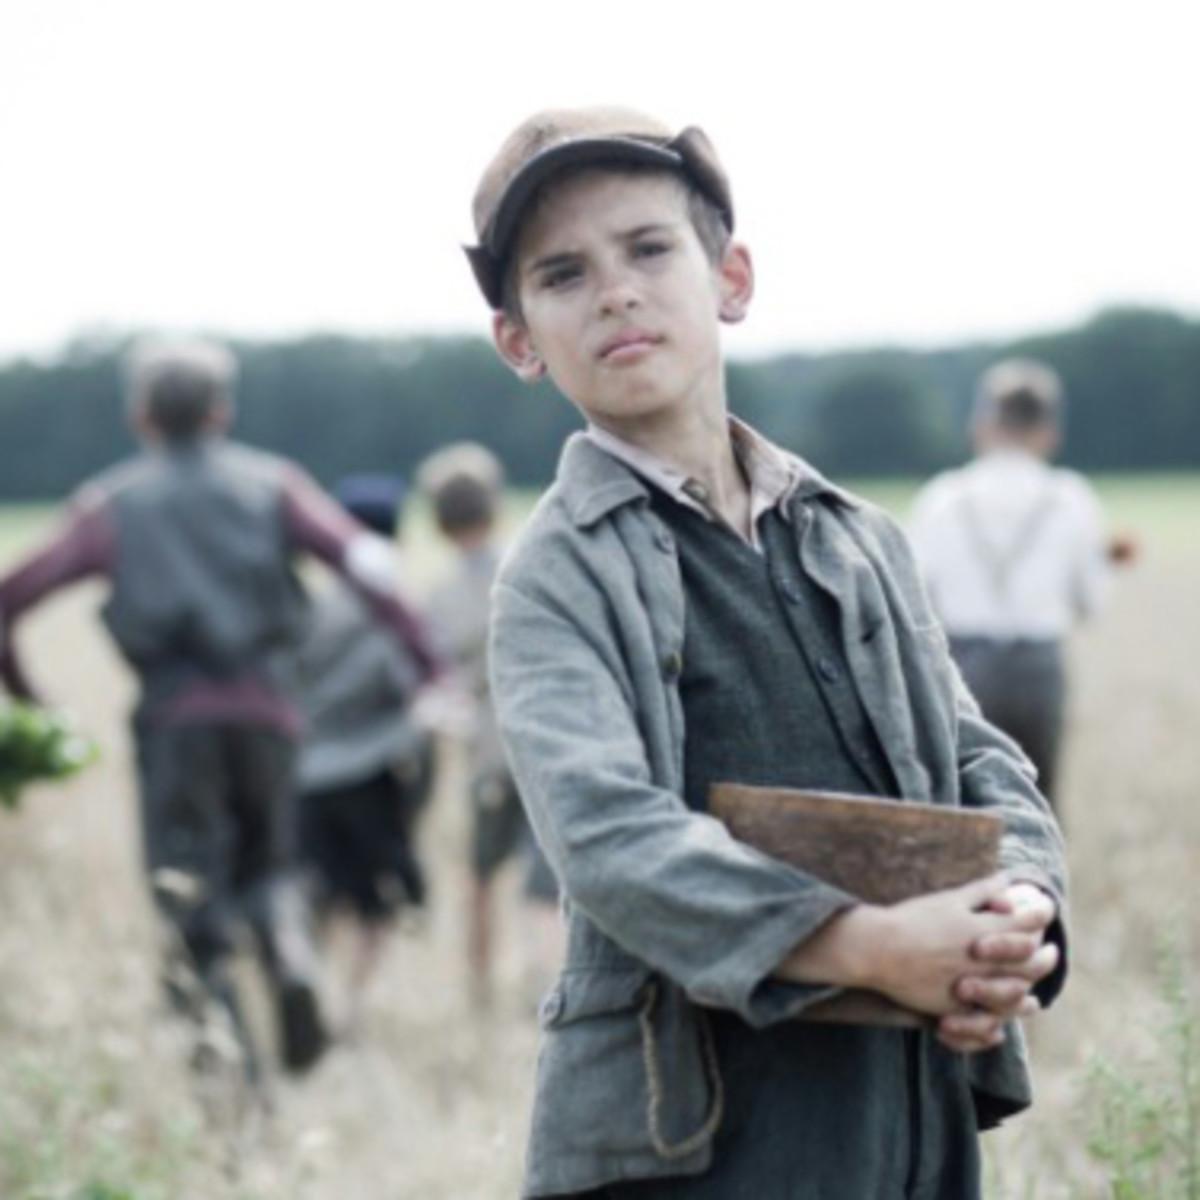 11th Annual Houston Jewish Film Festival Opening Night and Encore: Run Boy Run